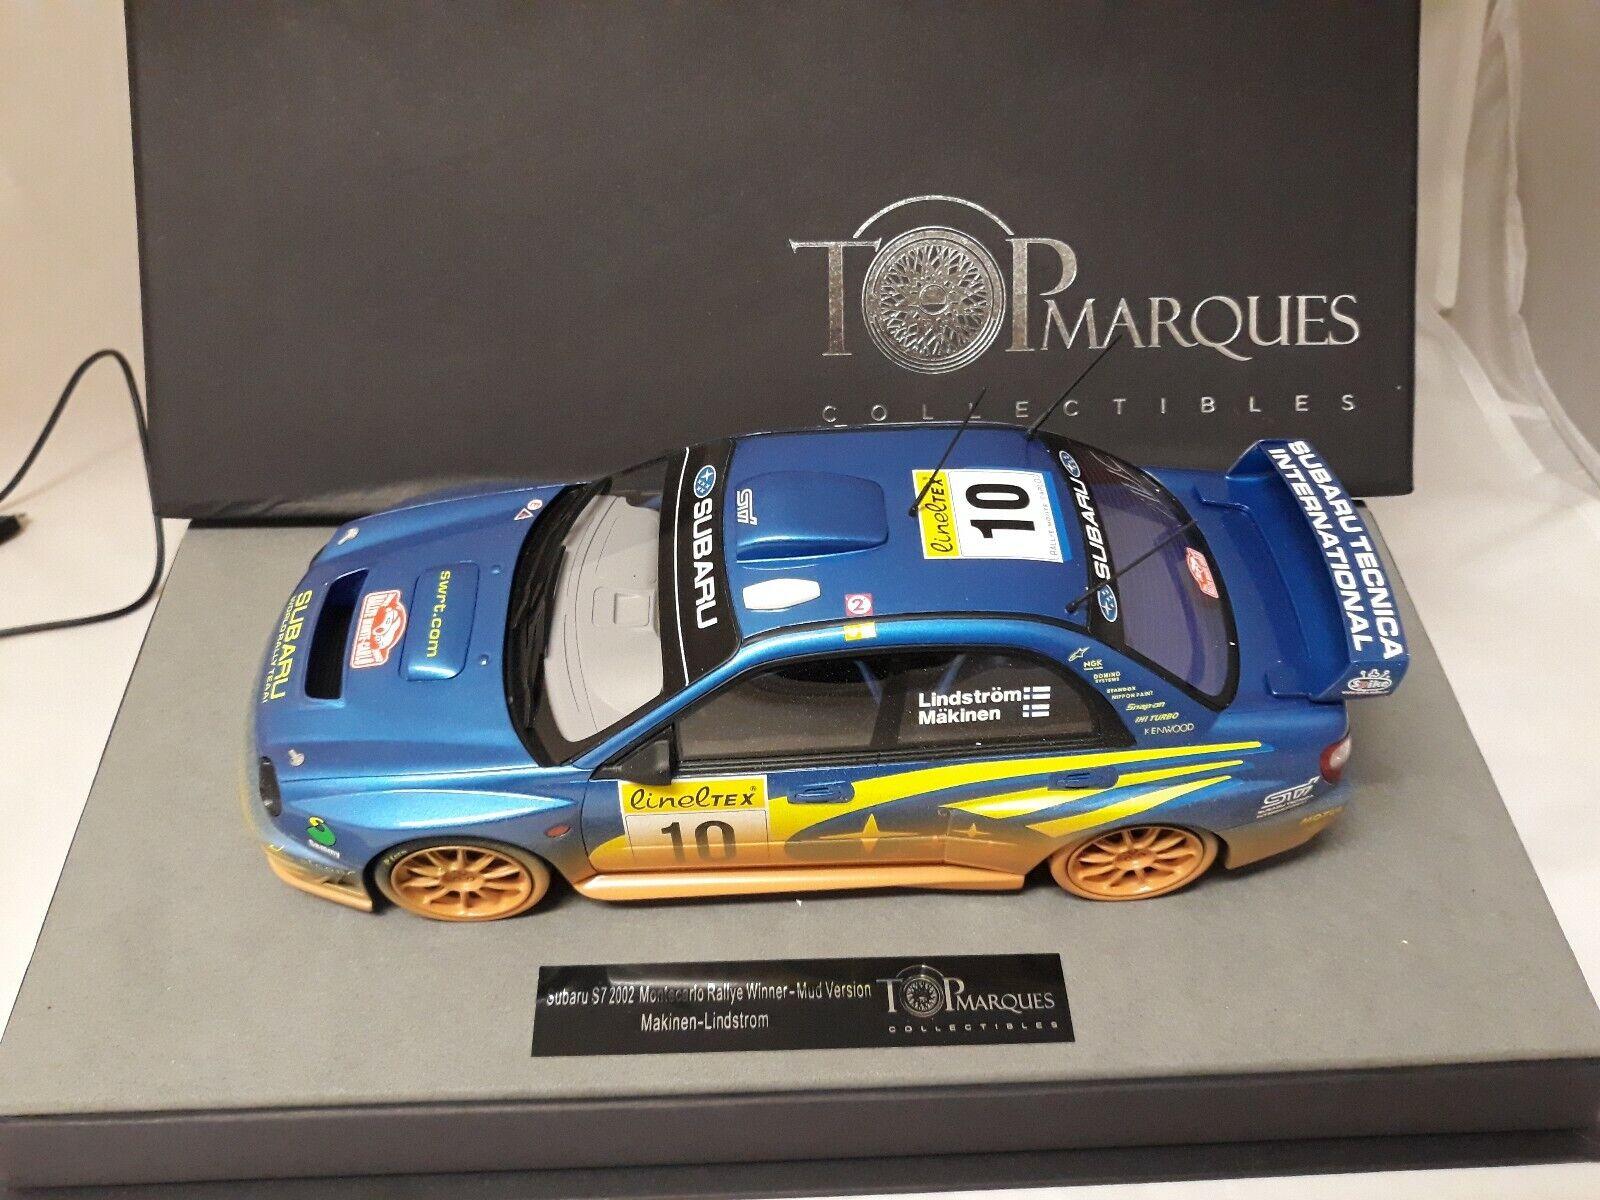 wholesape barato Top Marques Subaru S7 winner Rally MonteCochelo 2002 DIRTY Makinen Makinen Makinen Lindstrom 1 18  orden ahora disfrutar de gran descuento